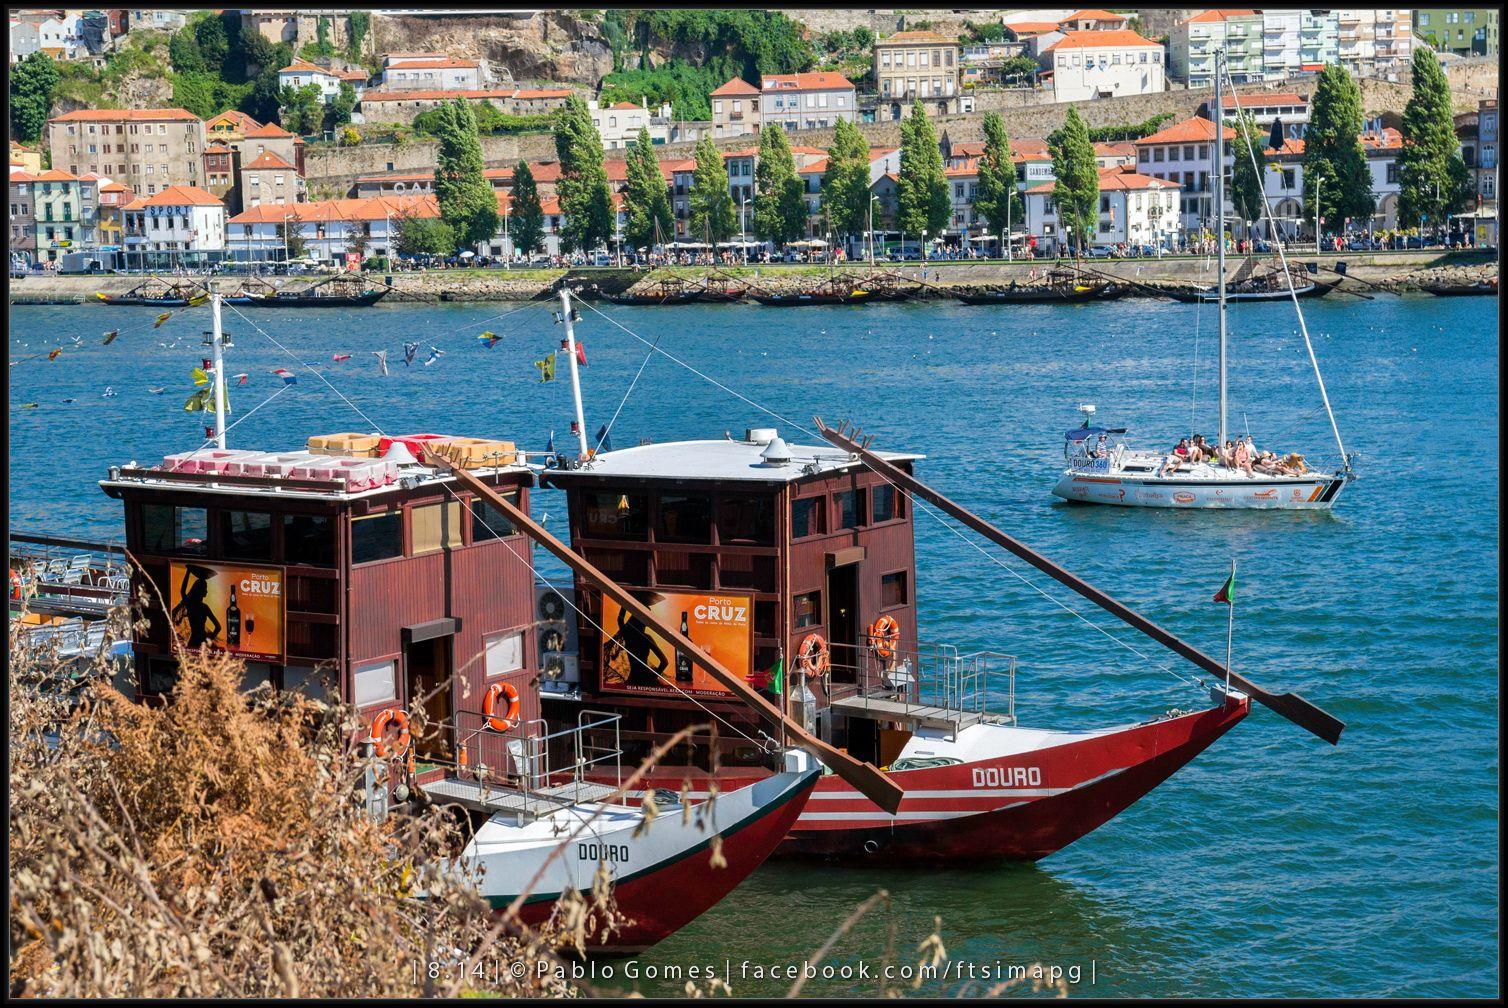 [2014 - Porto / Oporto - Portugal] #fotografia #fotografias #photography #foto #fotos #photo #photos #local #locais #locals #cidade #cidades #ciudad #ciudades #city #cities #europa #europe #boat #boats #barco #barcos #rabelo #rabelos #rio #rios #river #rivers #douro #duero @Visit Portugal @ePortugal @WeBook Porto @OPORTO COOL @Oporto Lobers